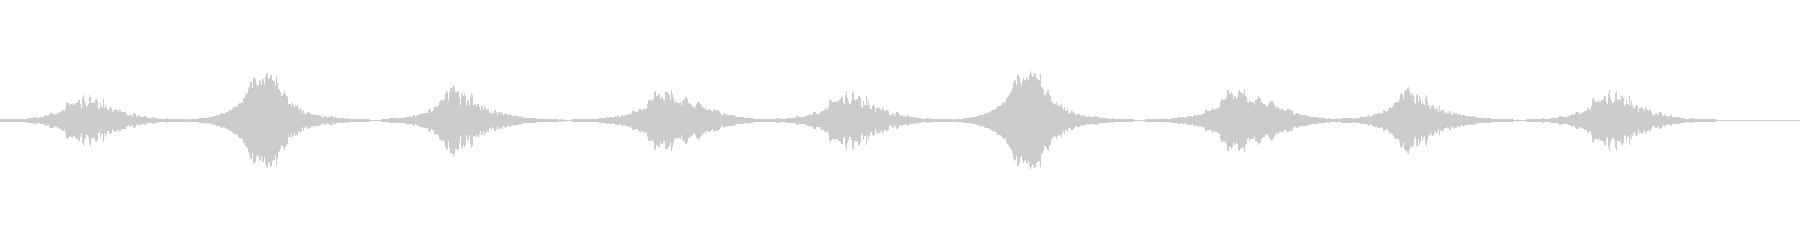 SE_アンビエントな雰囲気の未再生の波形